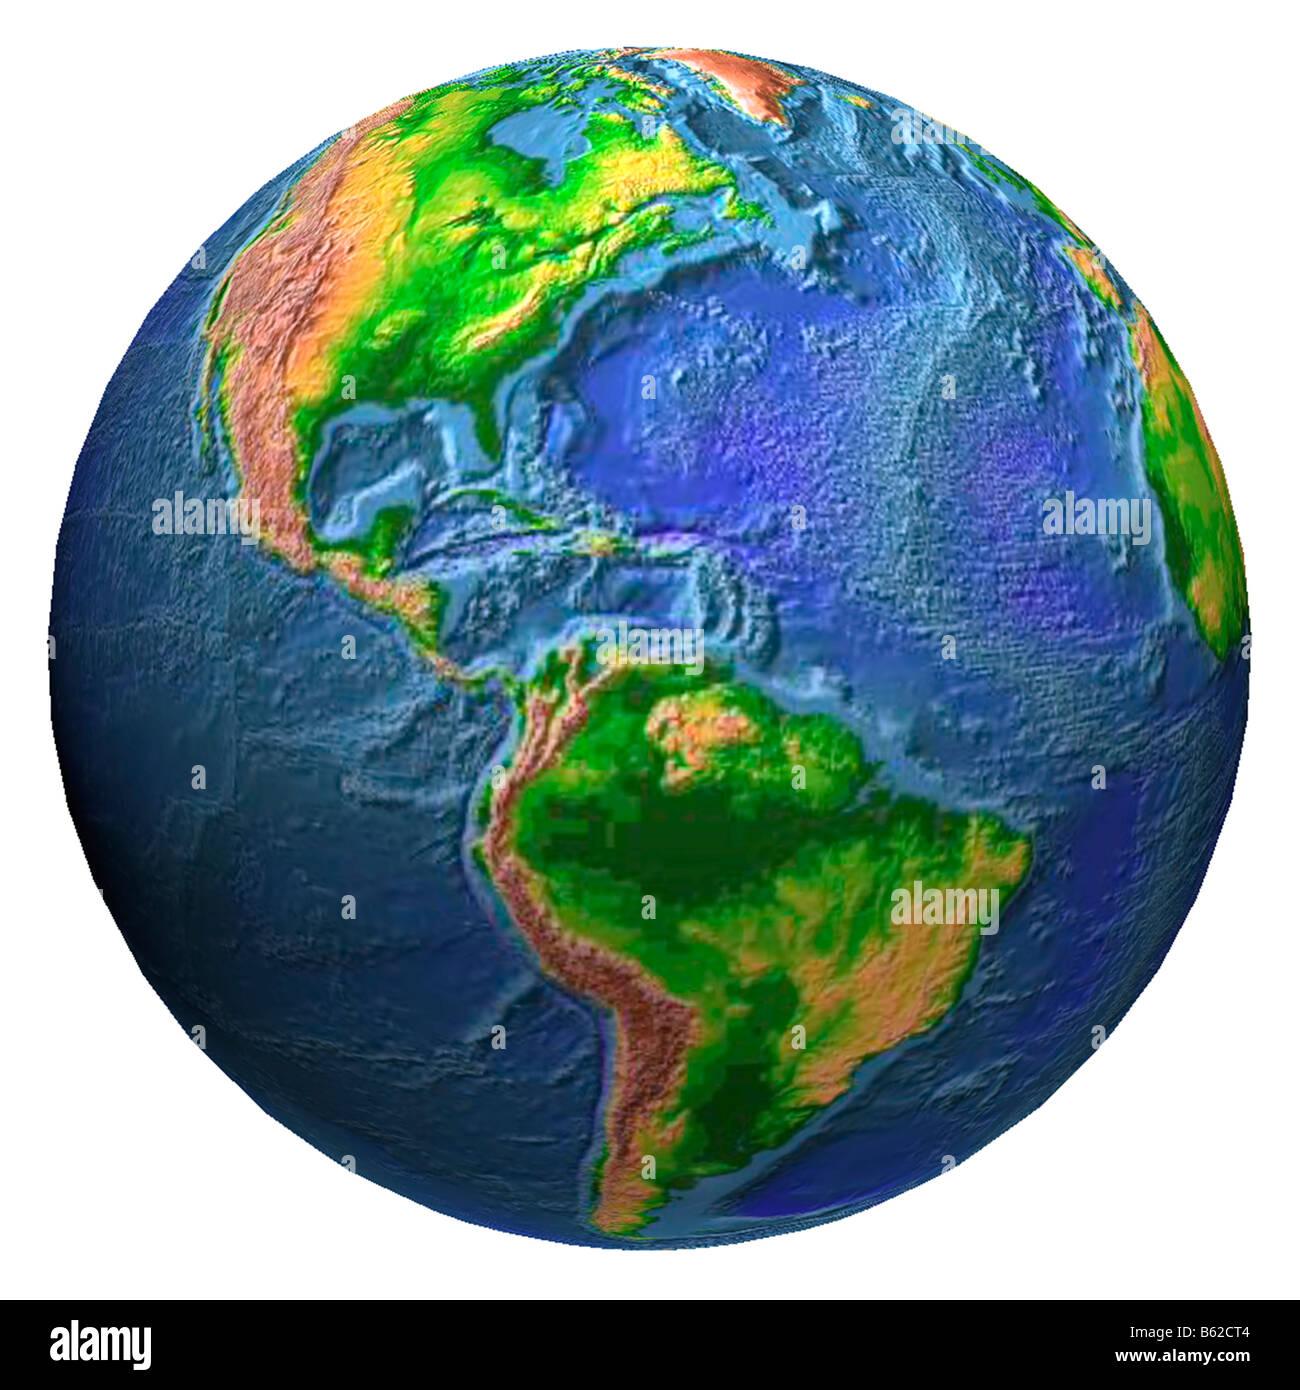 Earth Globe Showing Western Hemisphere In Relief Stock